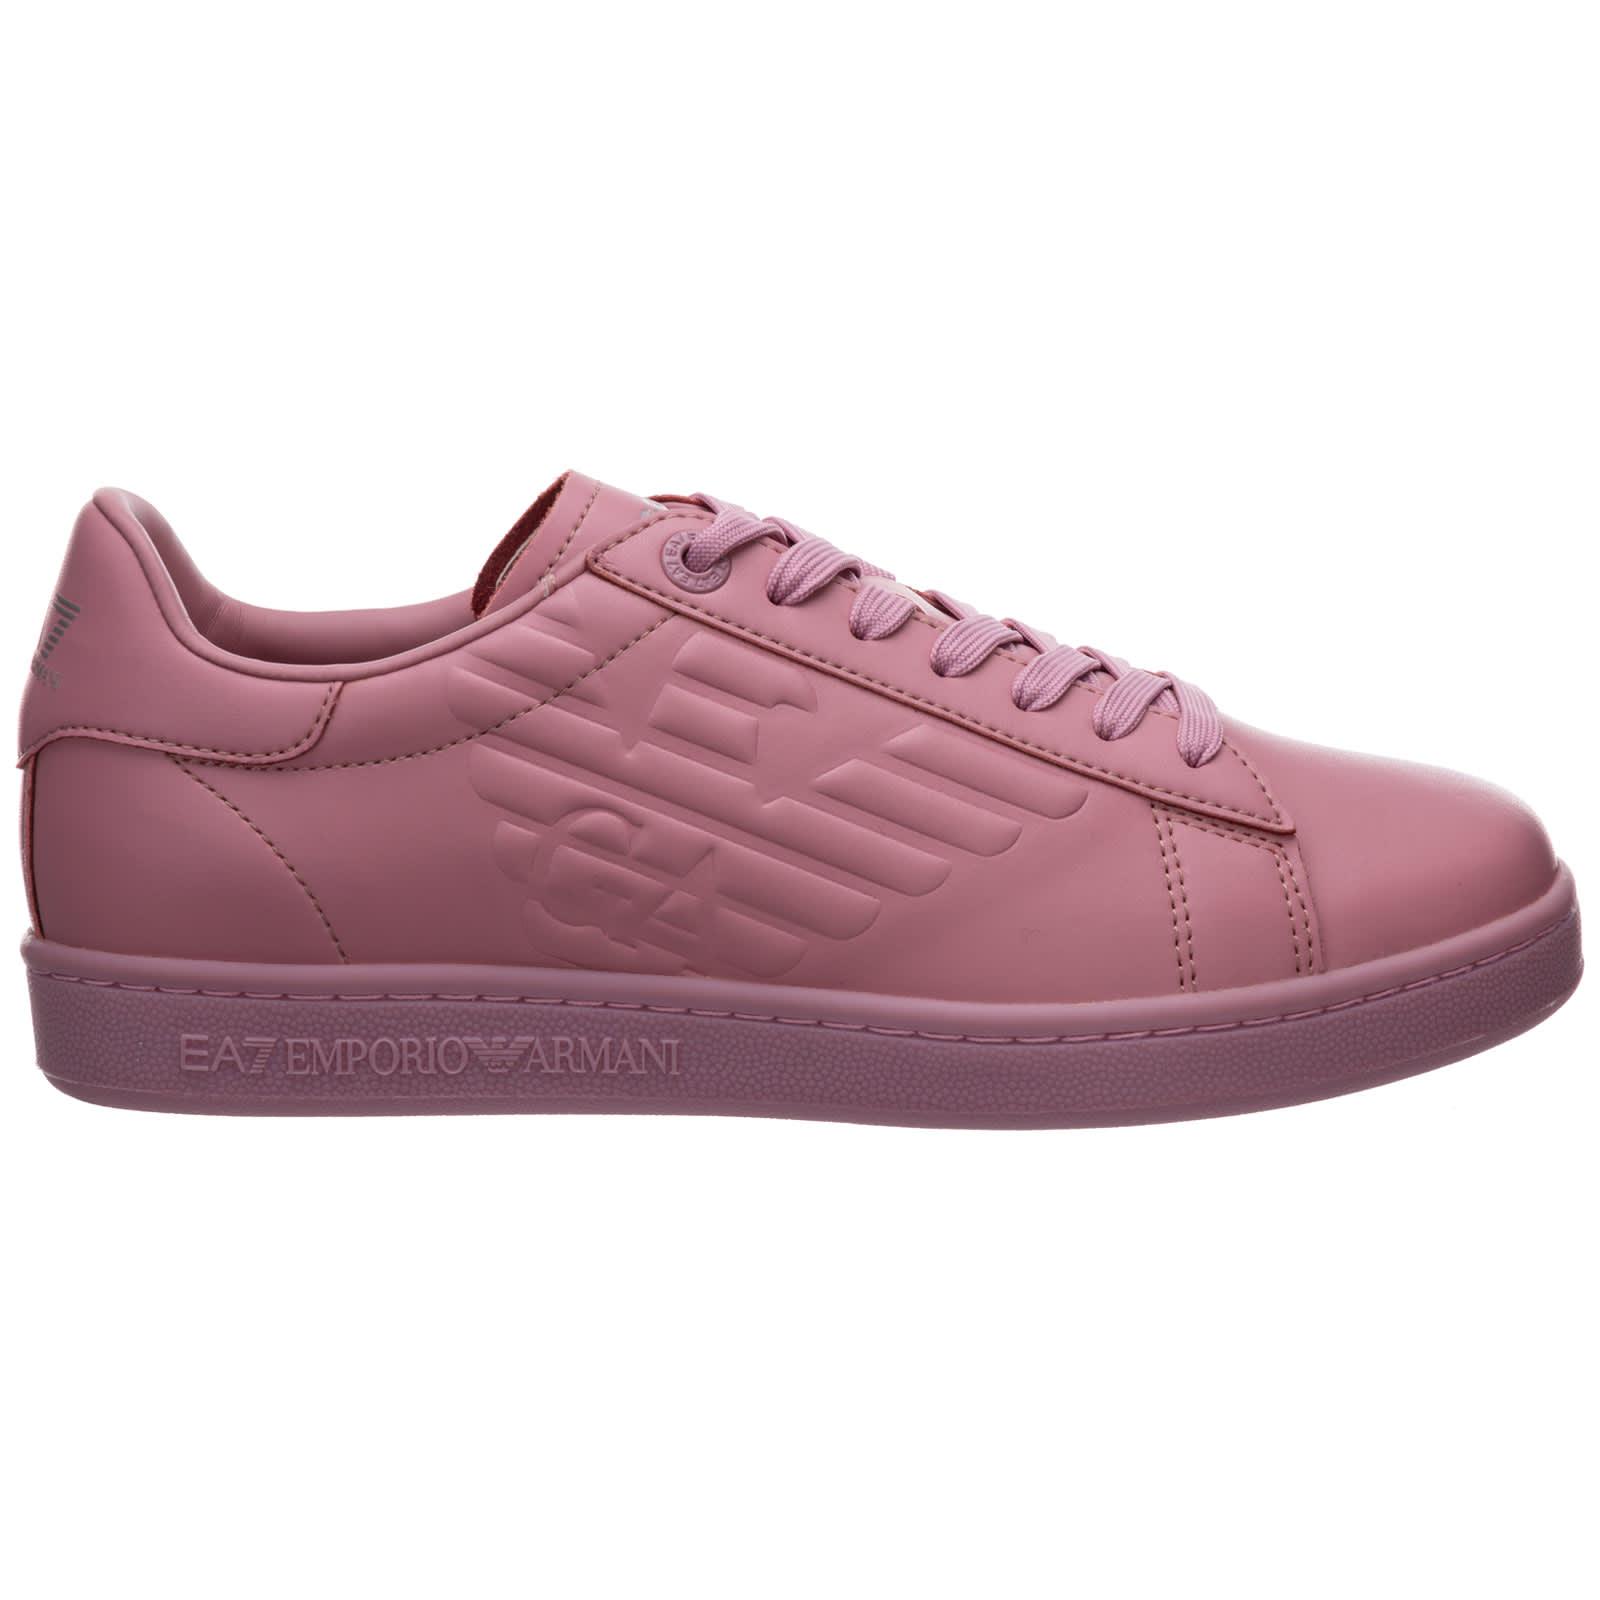 Emporio Armani Ea7 Open Sneakers